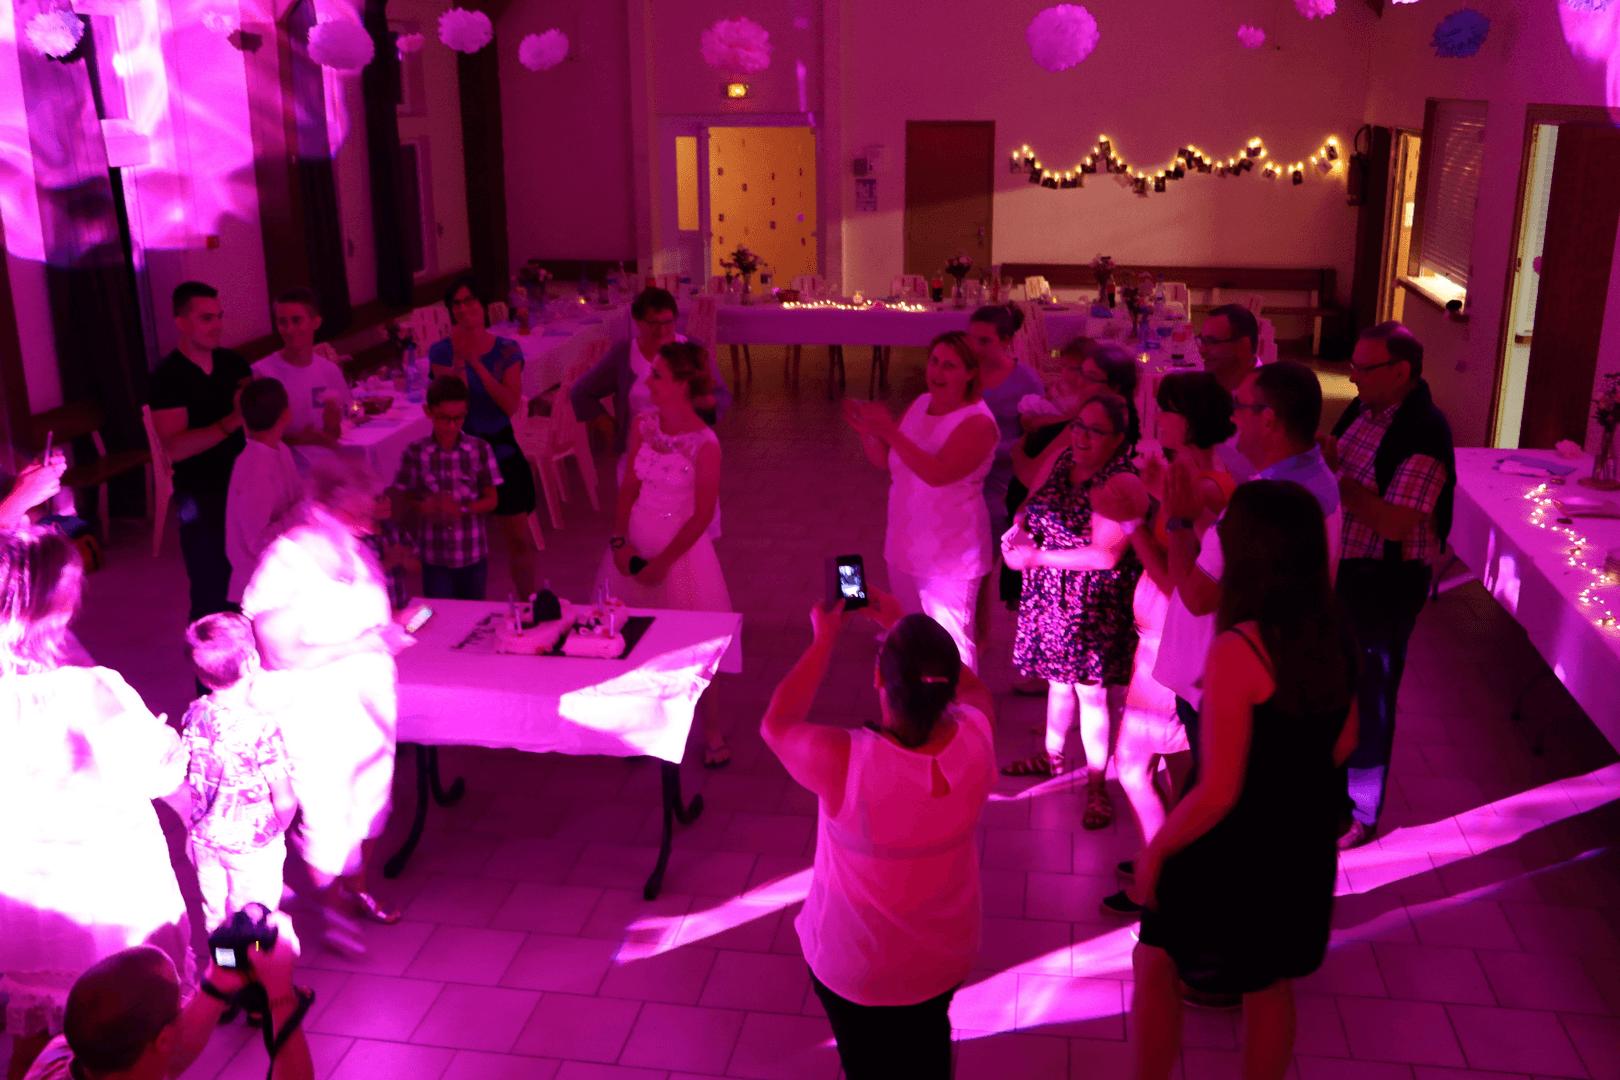 Anniversaire - Salle des fêtes de Dammard